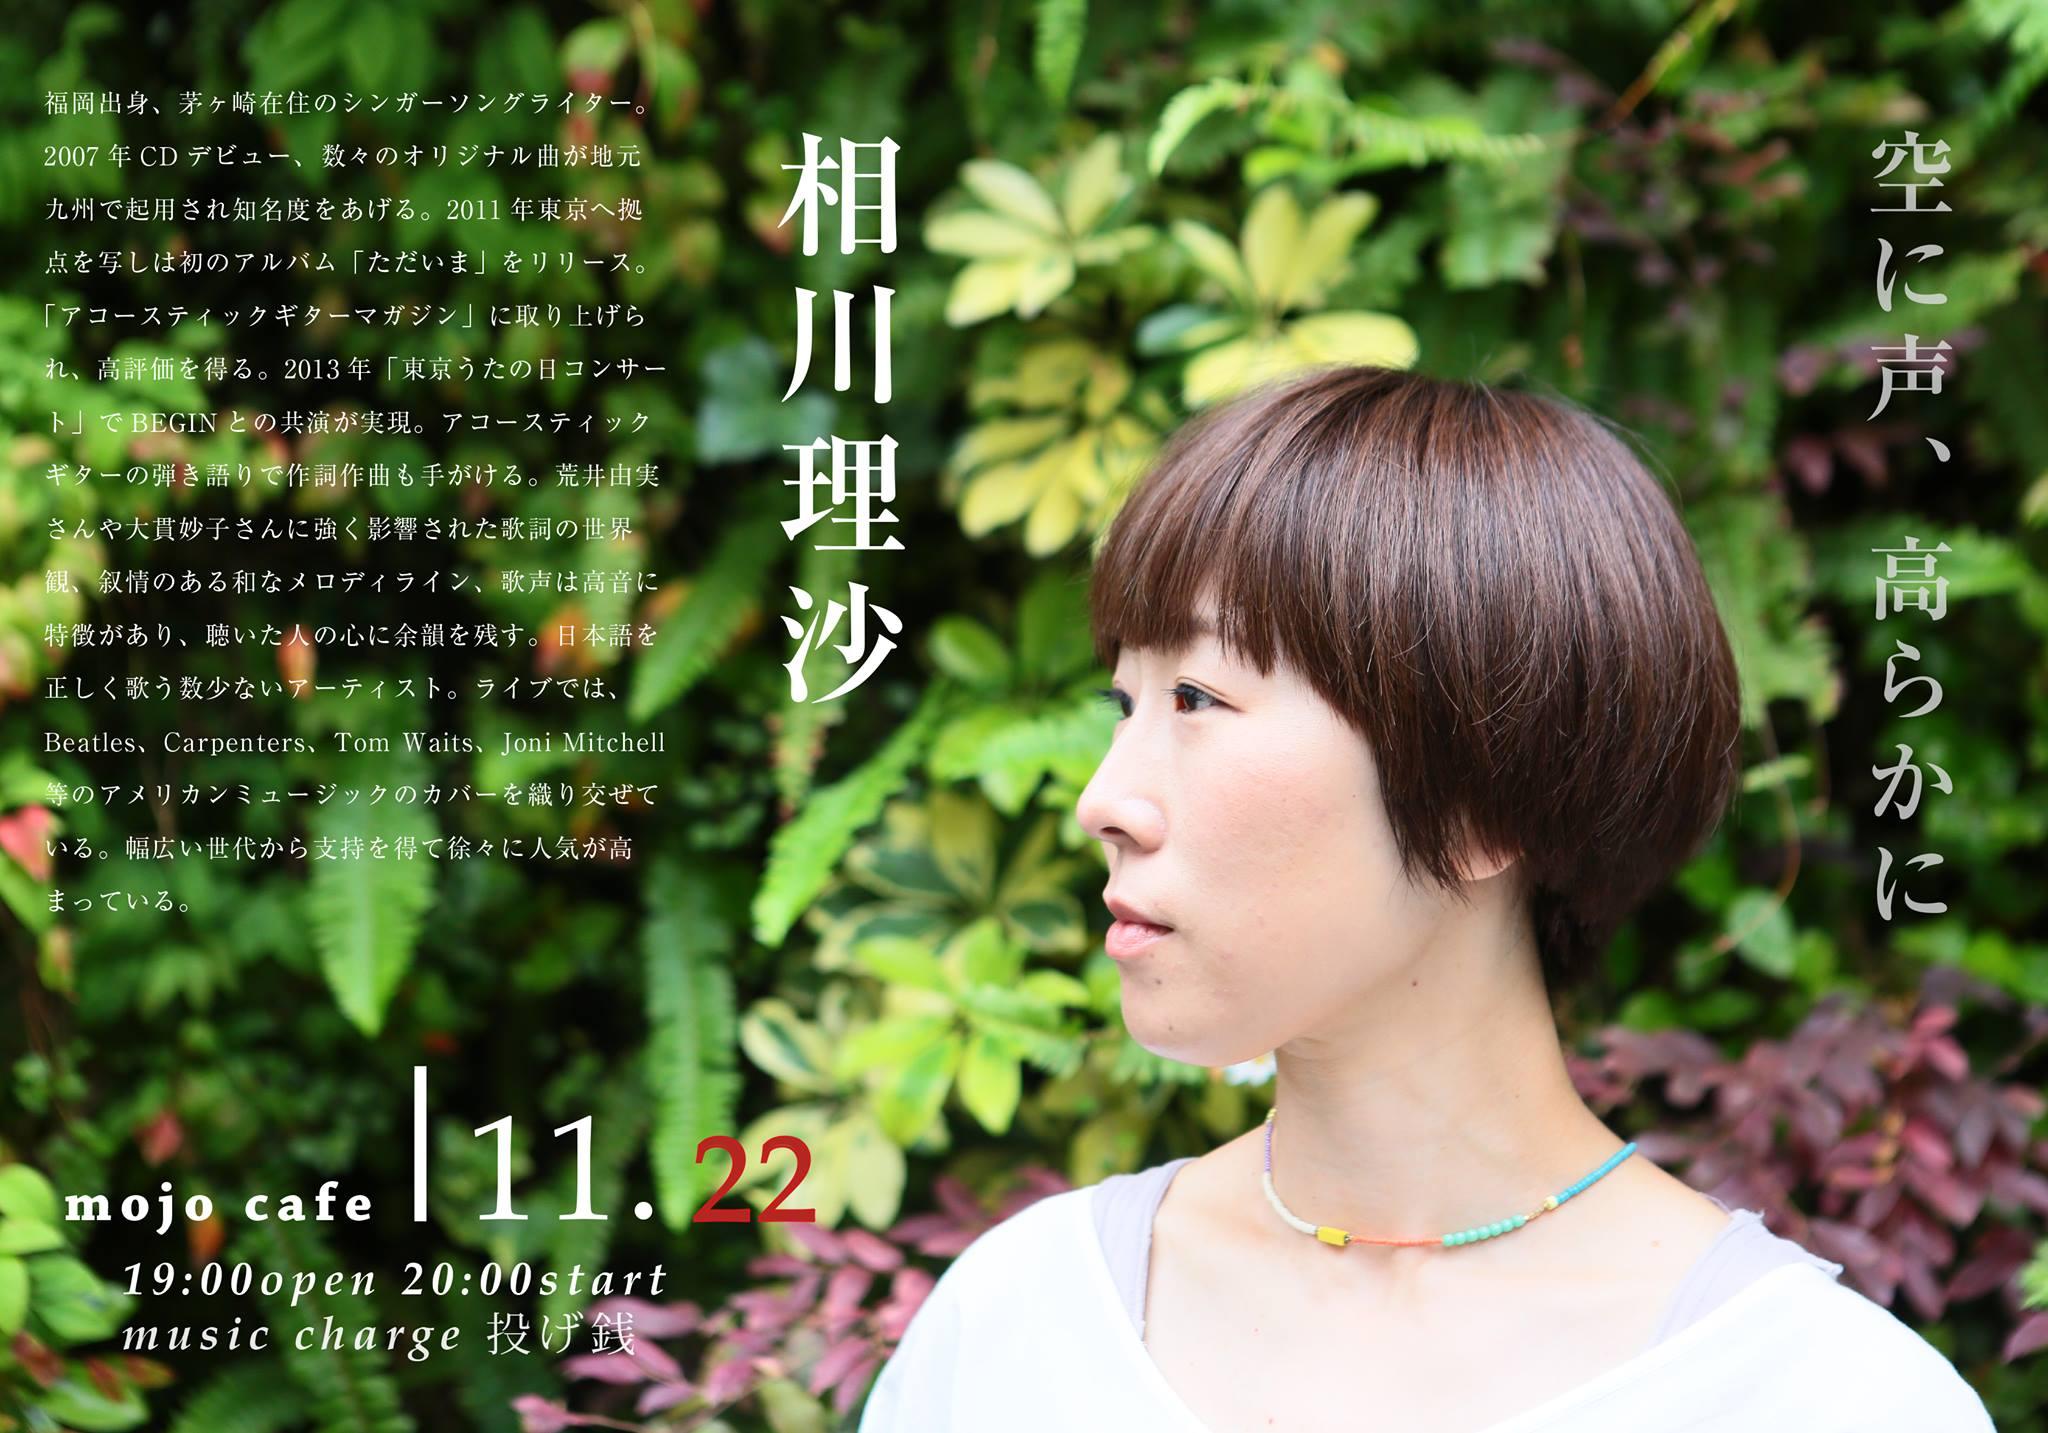 相川理沙 11.22 Mojo Cafe.jpg